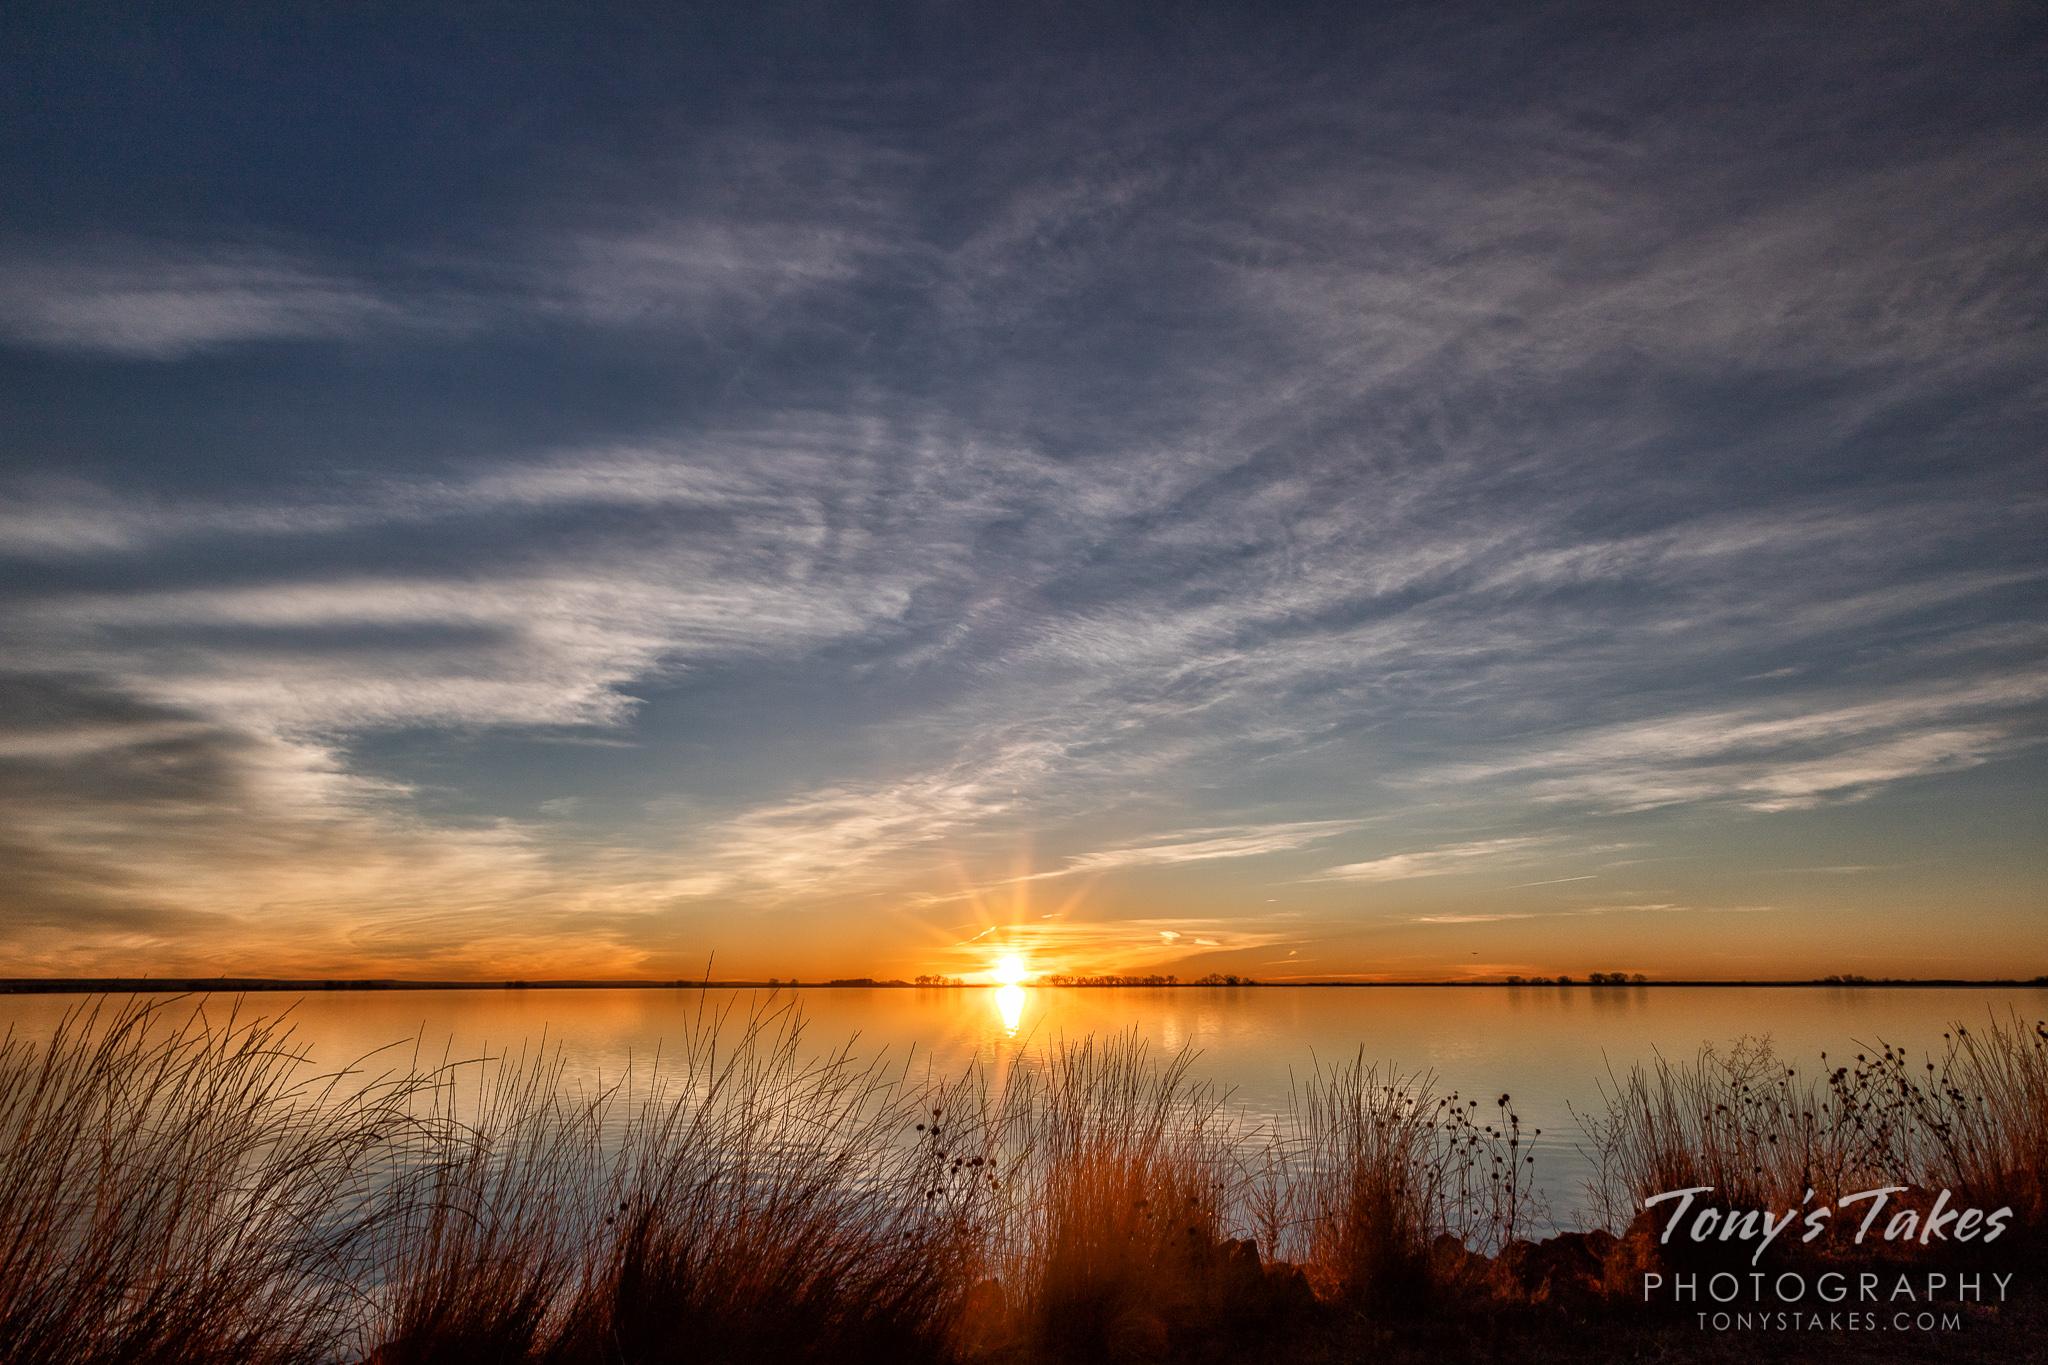 The sun bursts over the horizon at Jackson Lake State Park, Colorado. (© Tony's Takes)